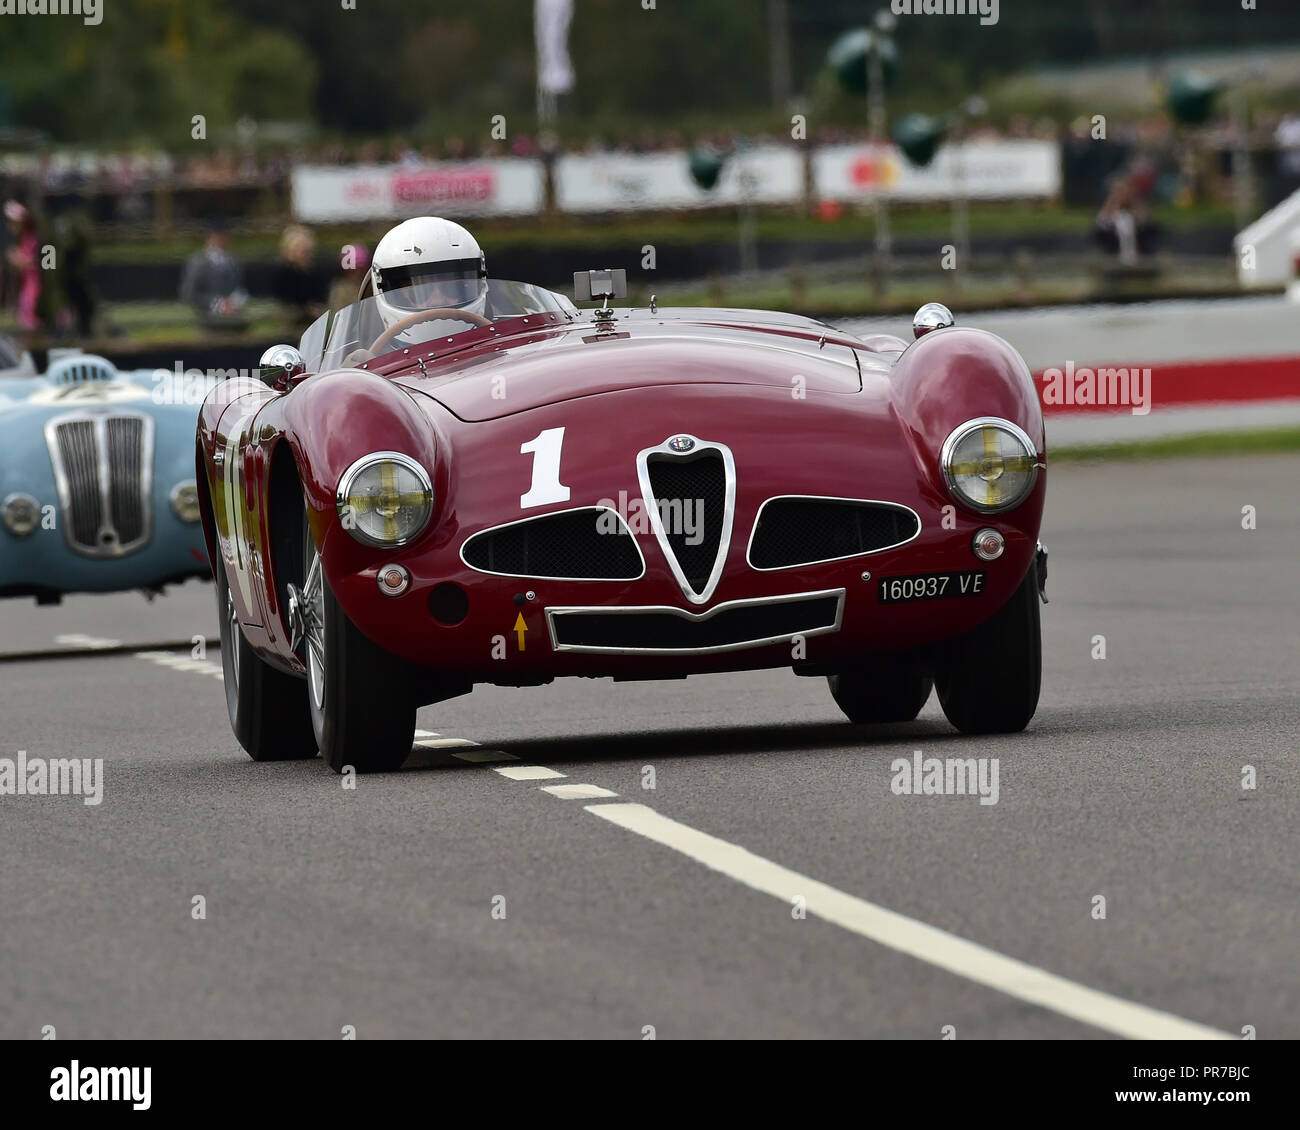 Christopher Mann, Alfa Romeo Disco Volante, Freddie März Memorial Trophy, Sportwagen, 1952 bis 1955, Goodwood Revival 2018, September 2018, Automobil Stockbild